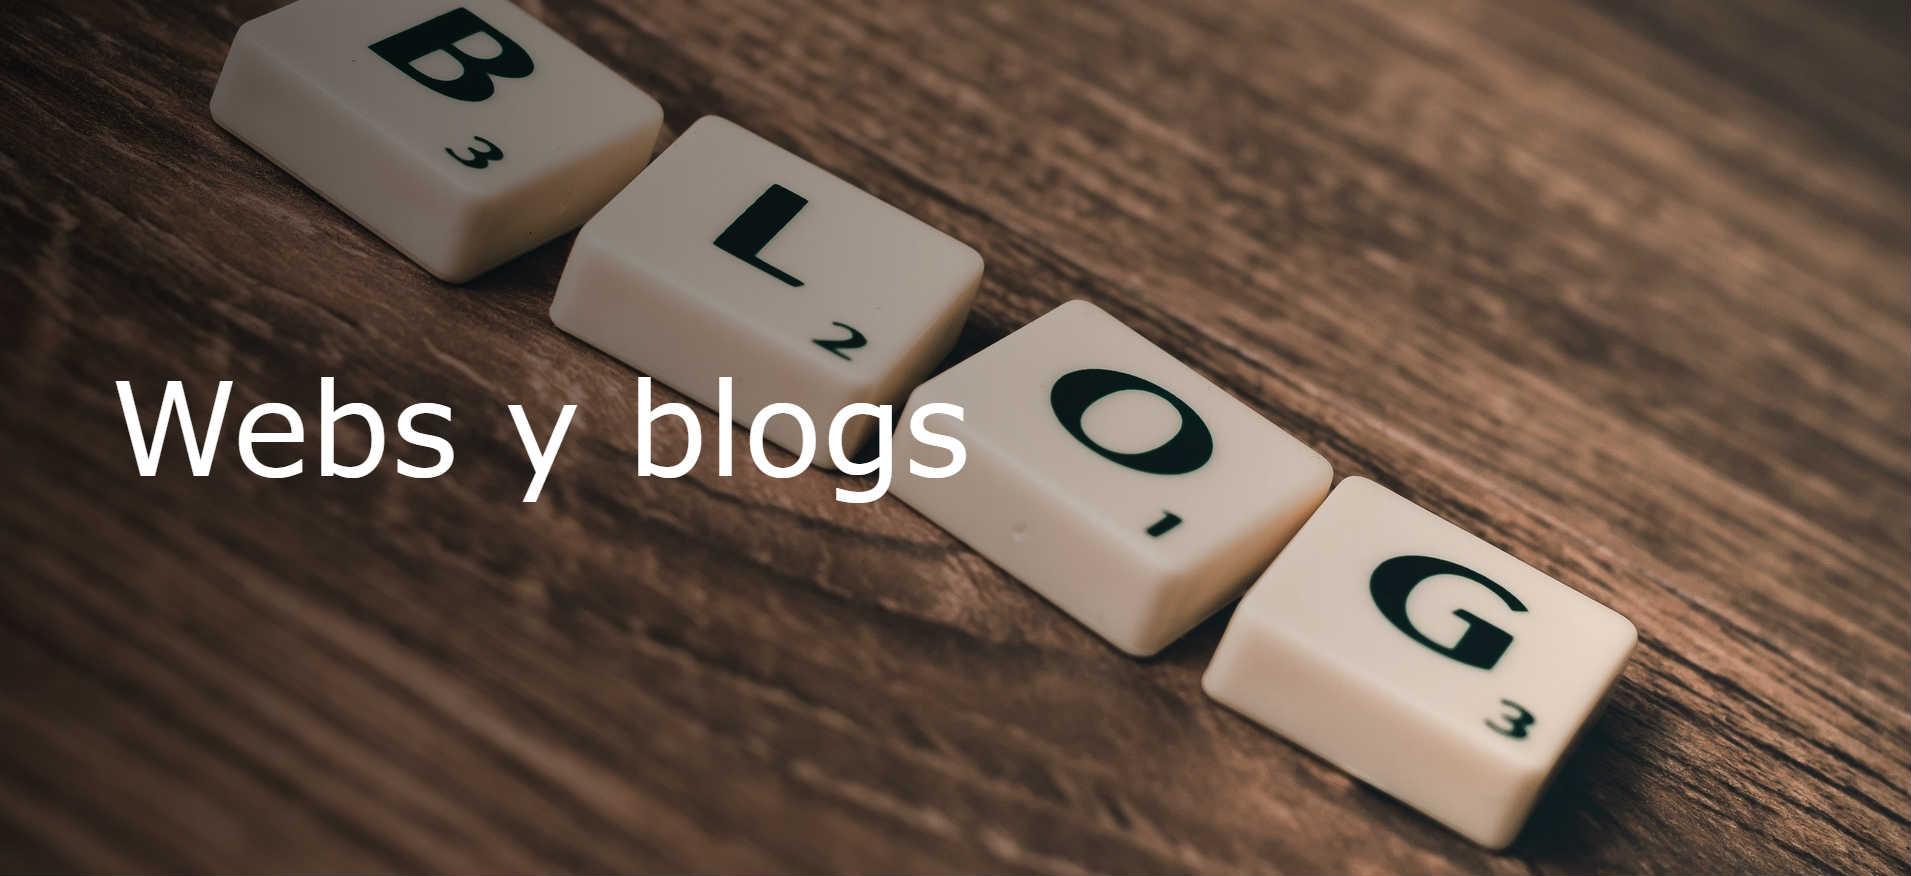 Webs y blogs